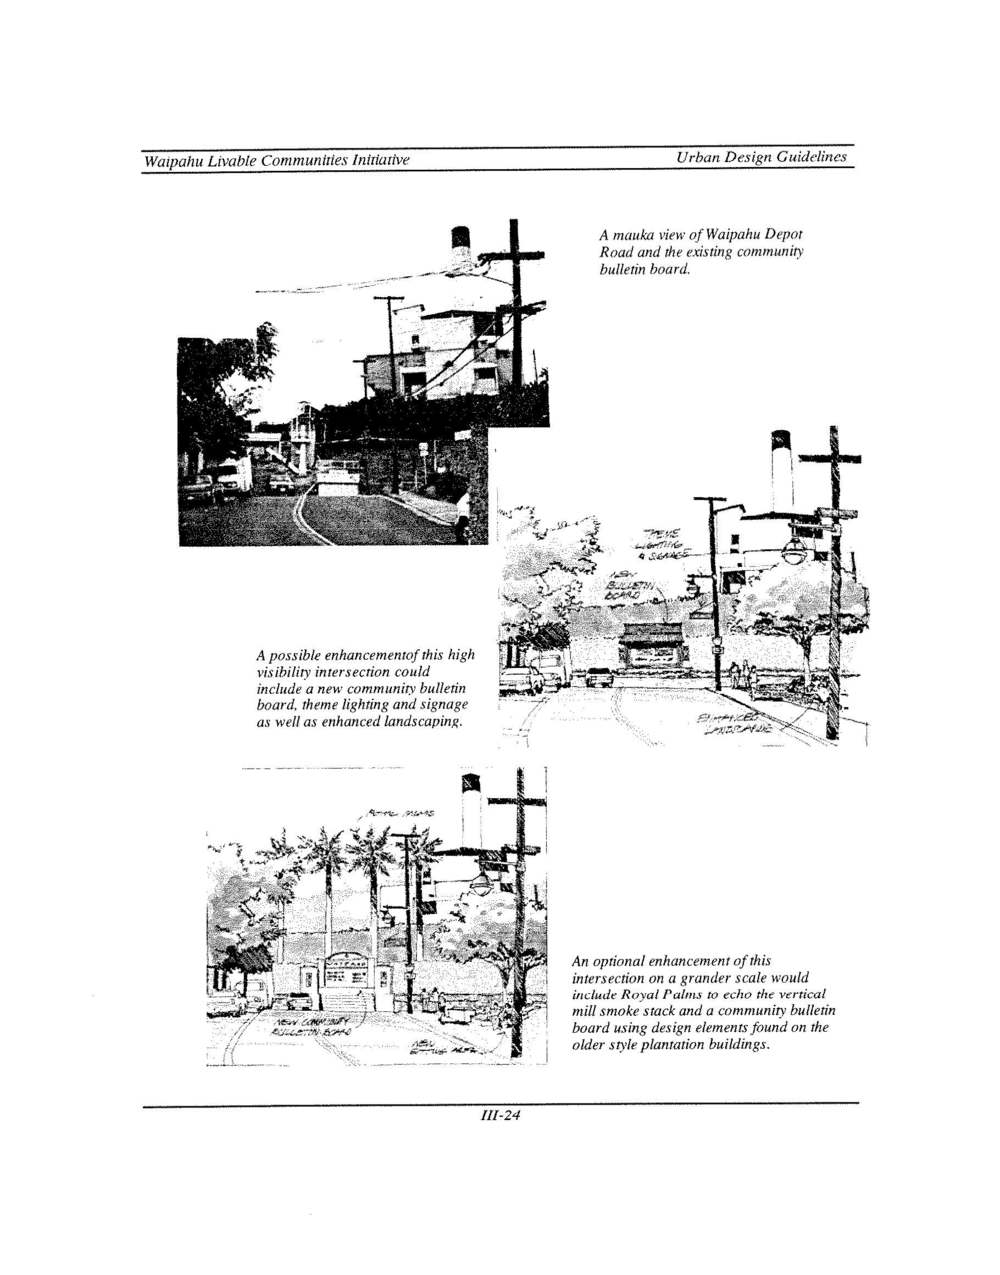 160531_WaipahuLivableCommunities(1998)_Page_114.jpg